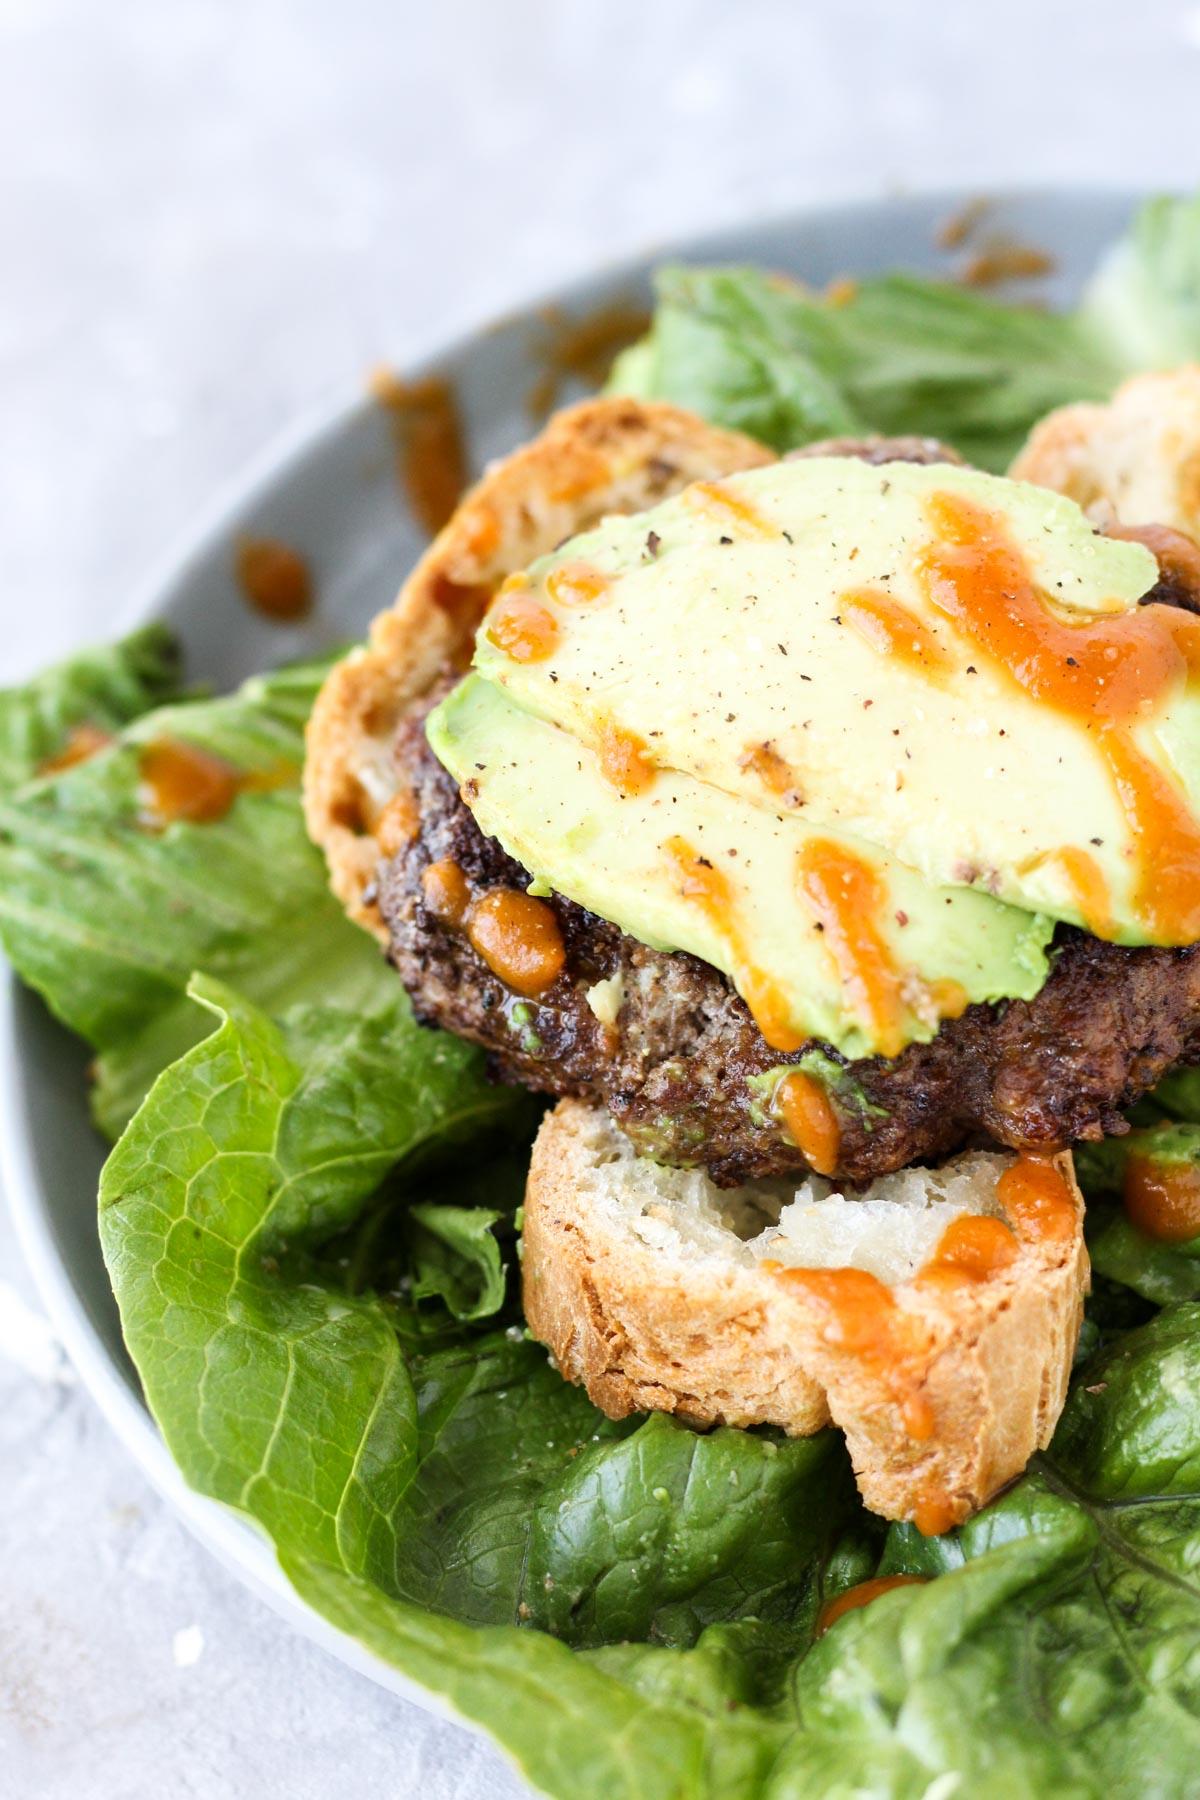 Burger on gluten-free bread with avocado.